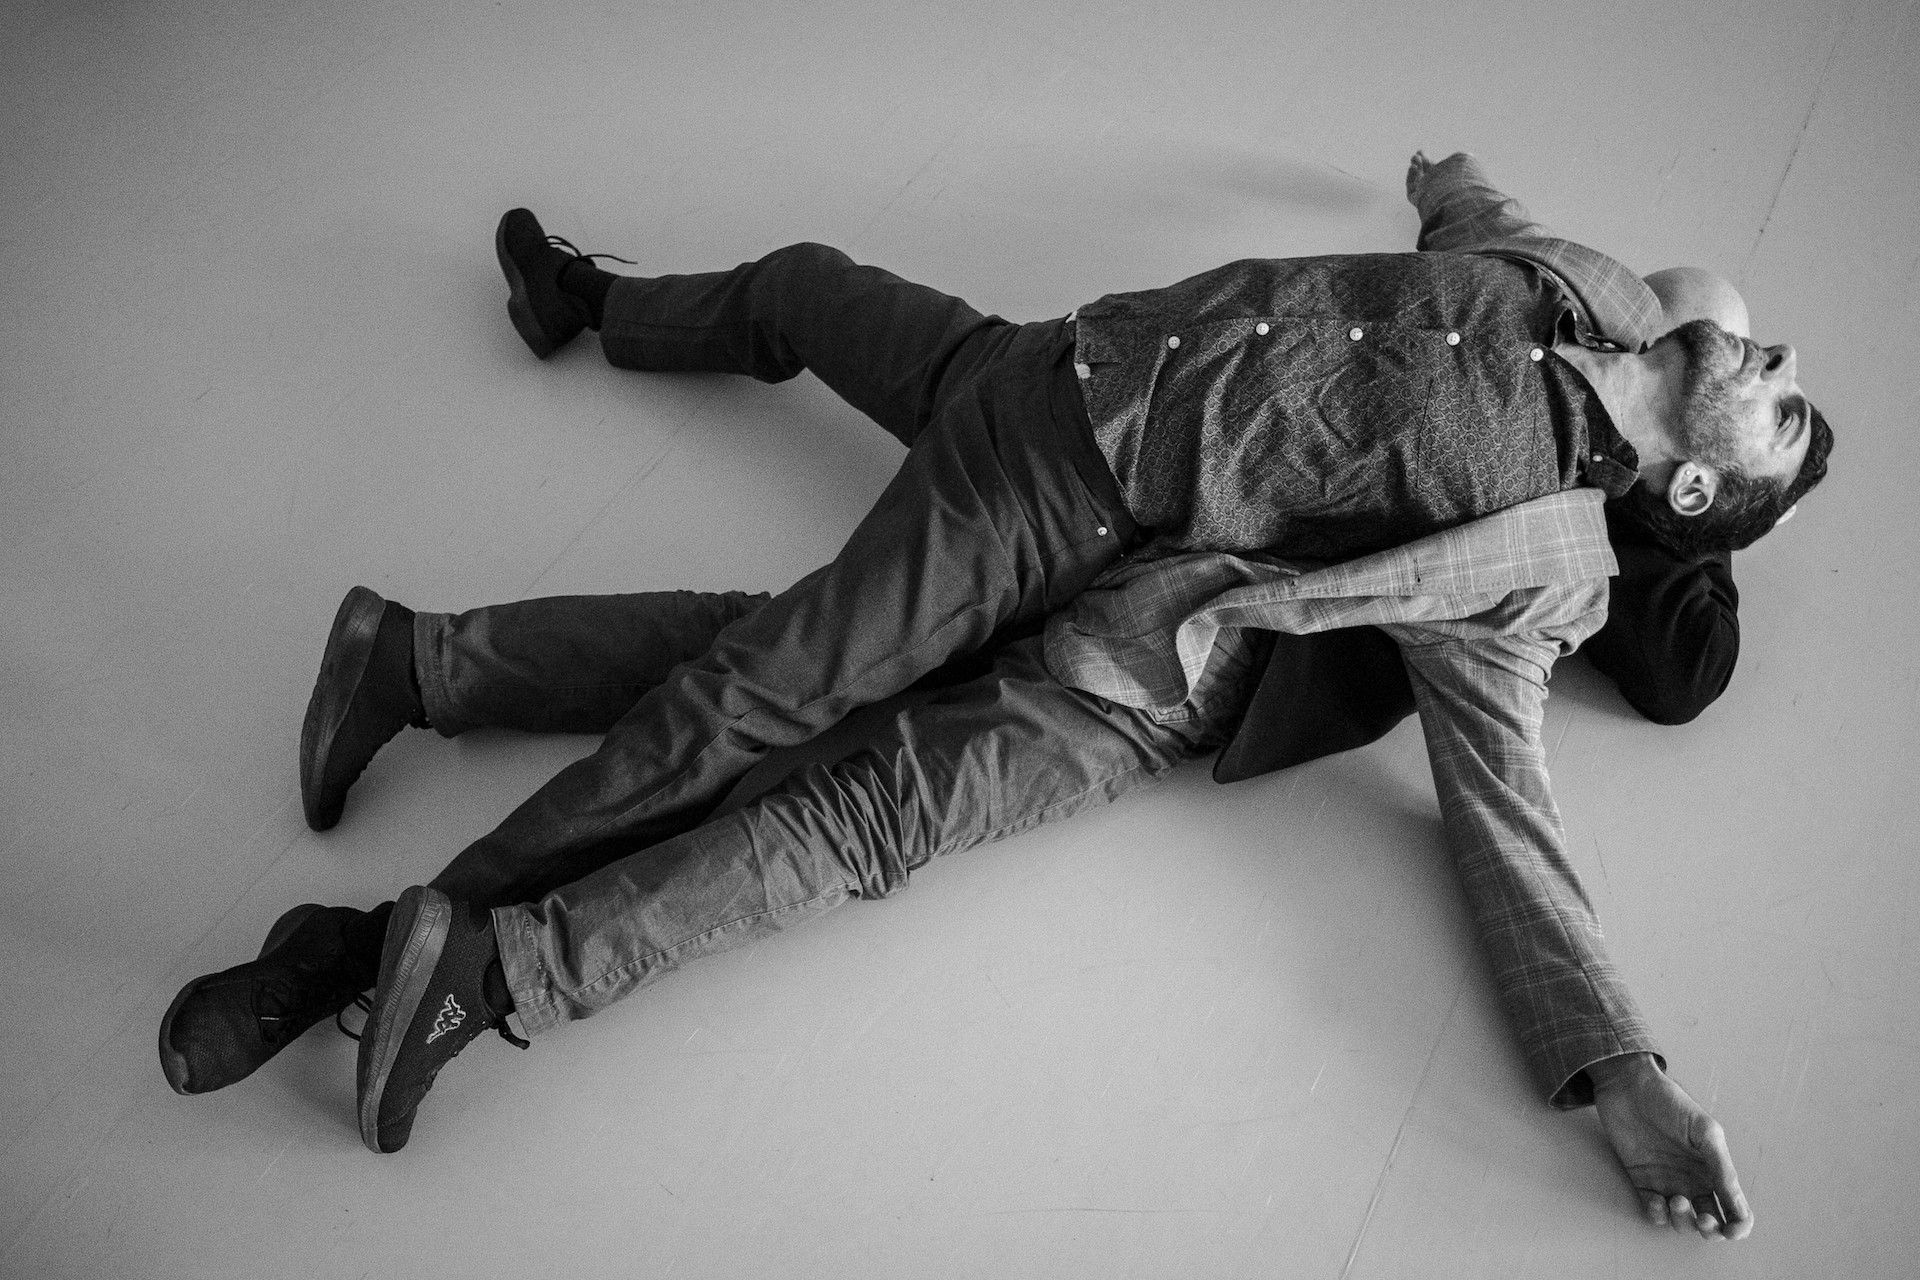 Kaiser_Antonino_Dance_Ensemble-L-État-des-Choses_Foto_Avishai-Finkelstein